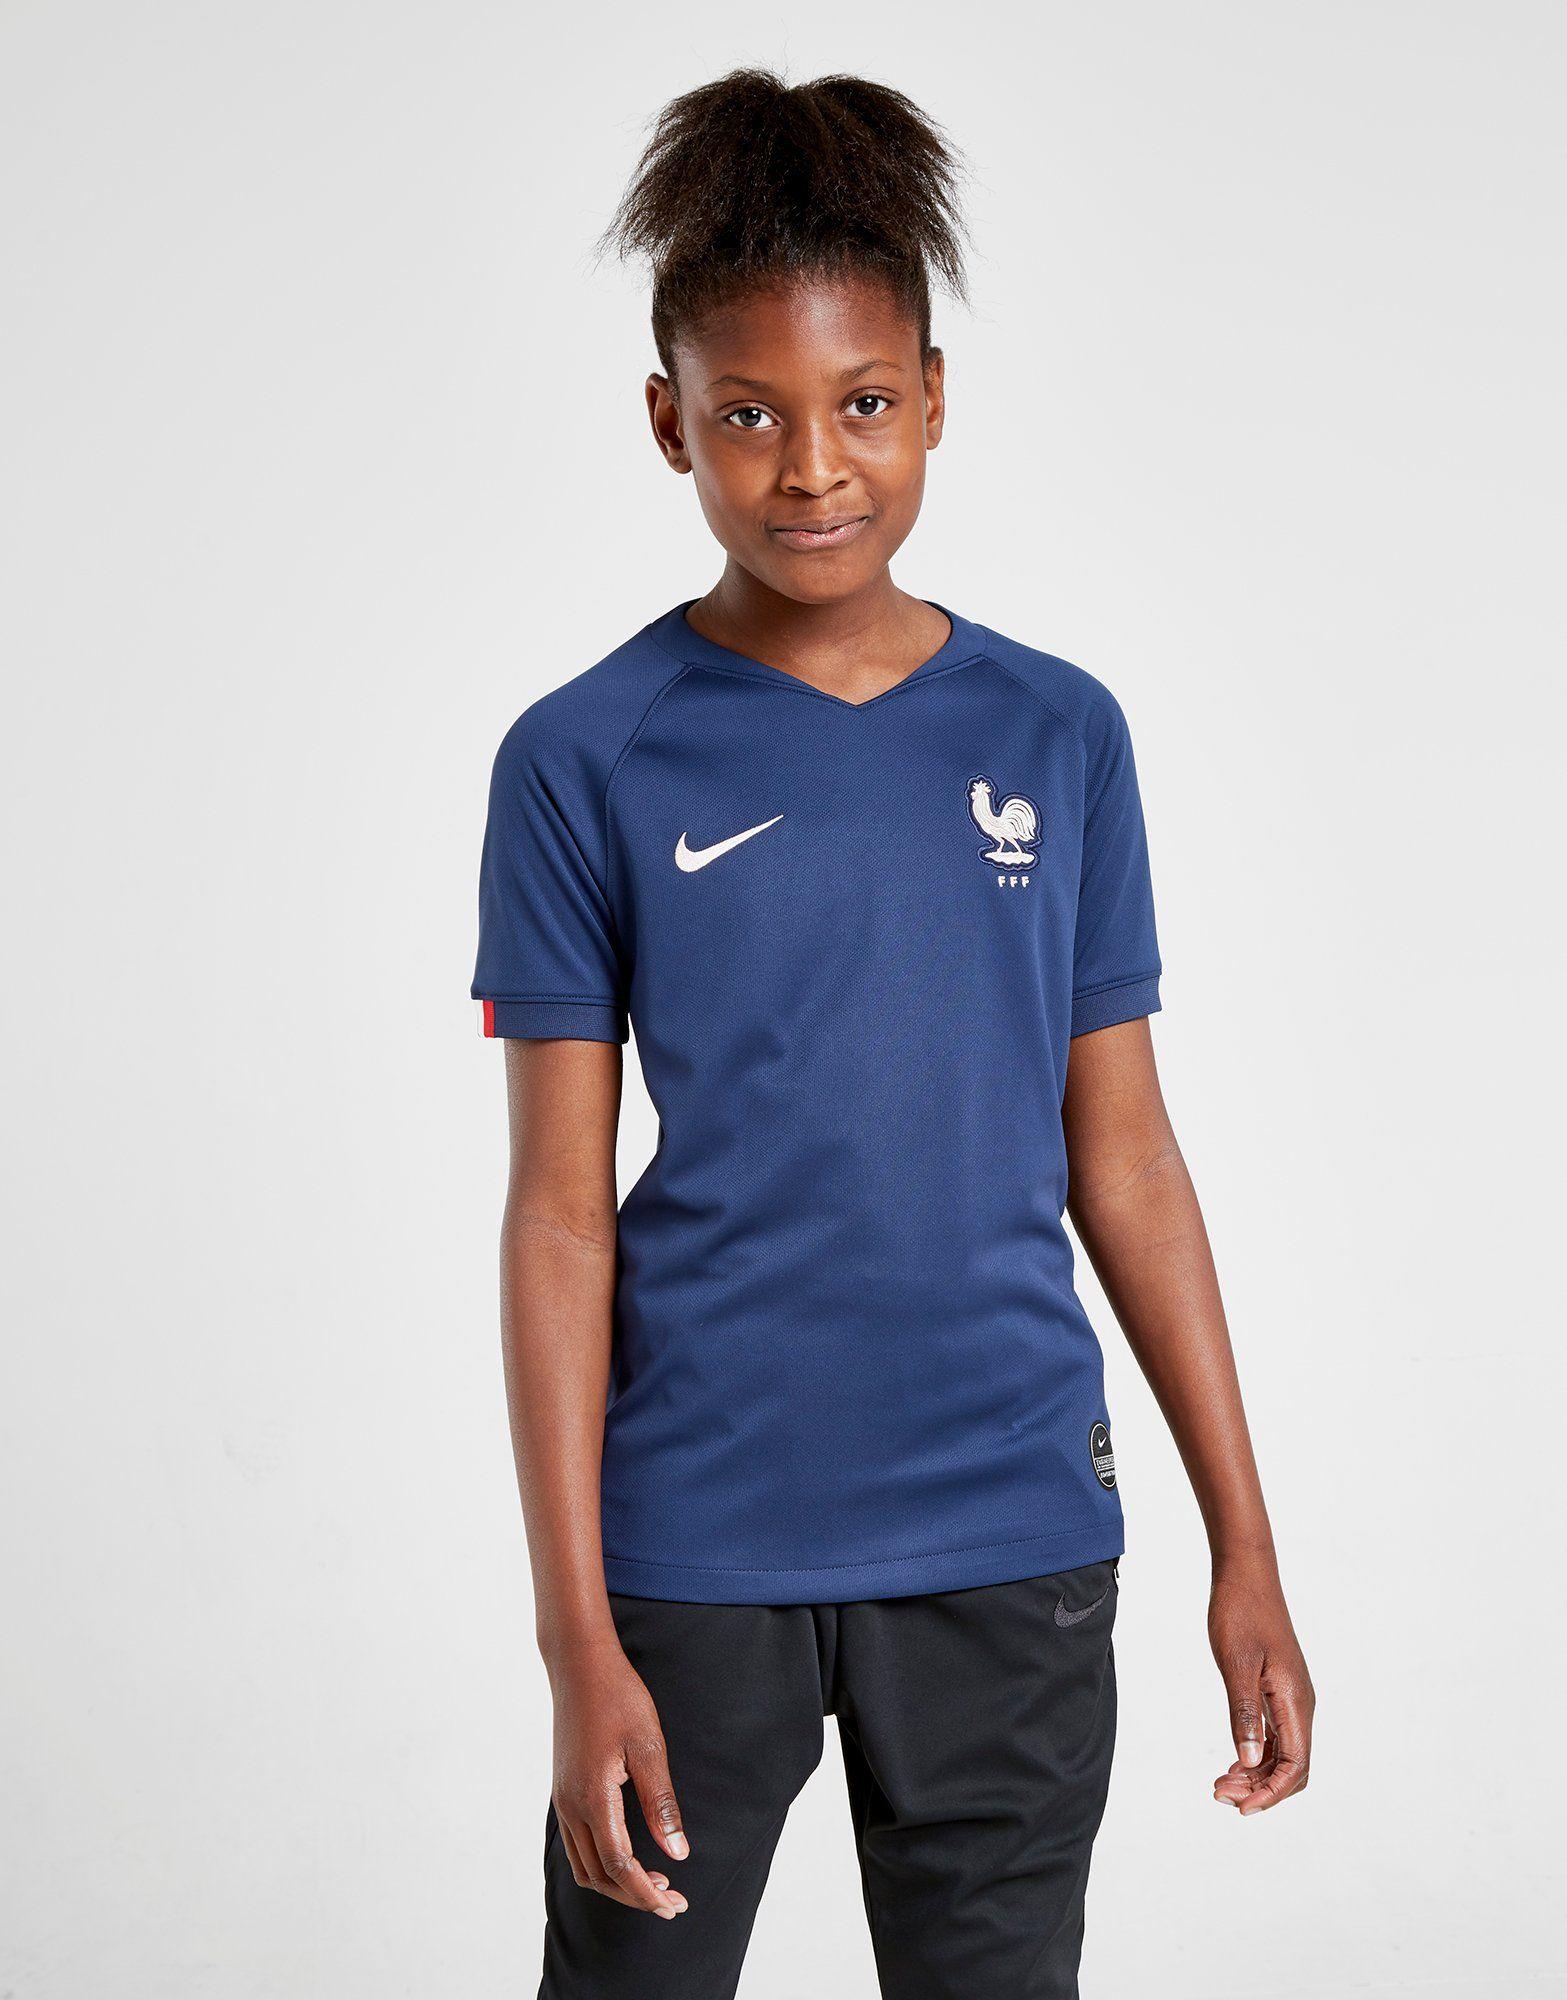 Nike Ruckus Junior